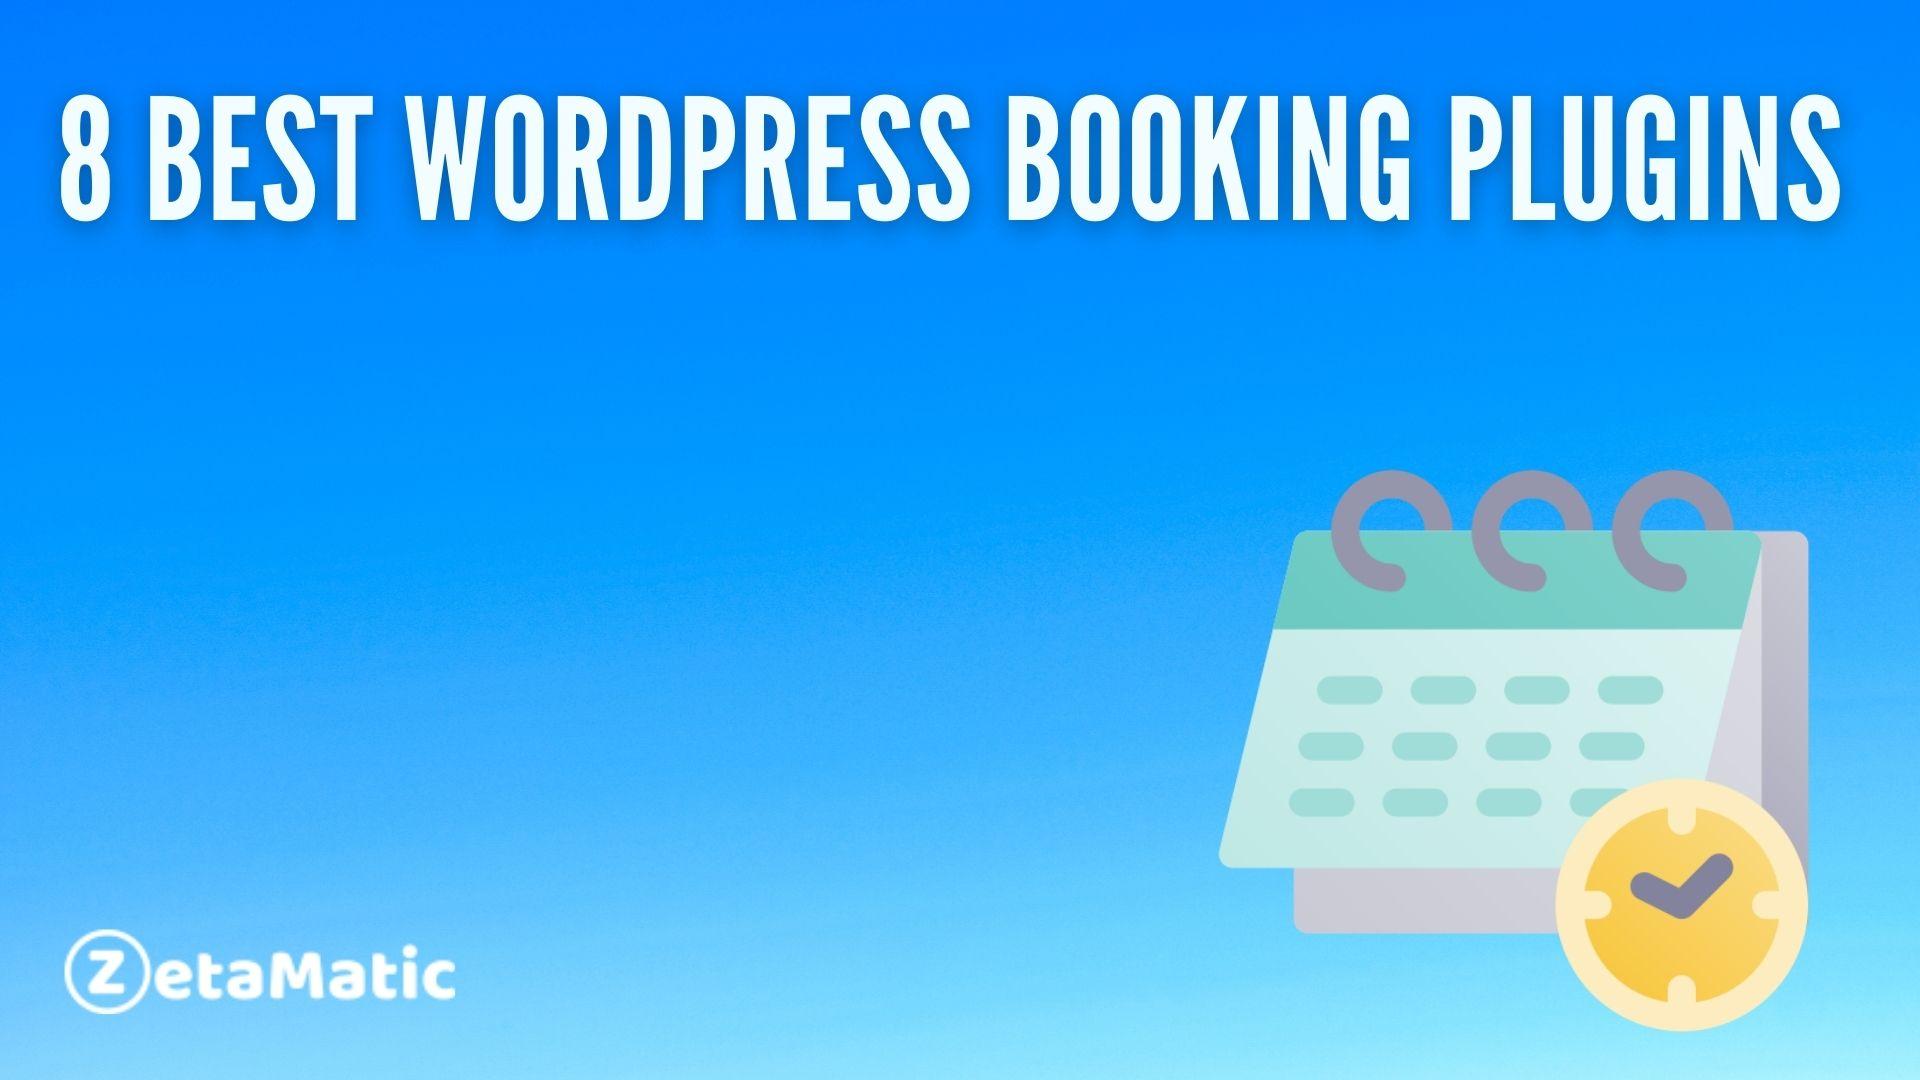 8 Best WordPress Booking Plugins